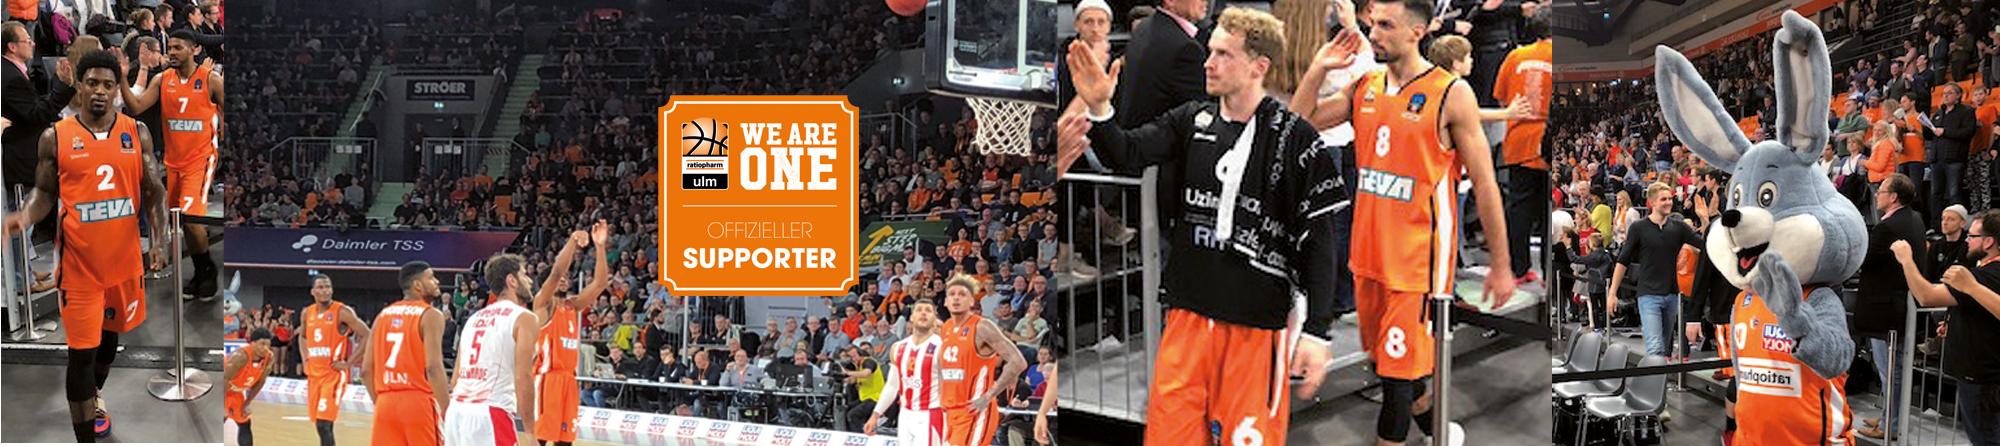 basketball-Ulm we support